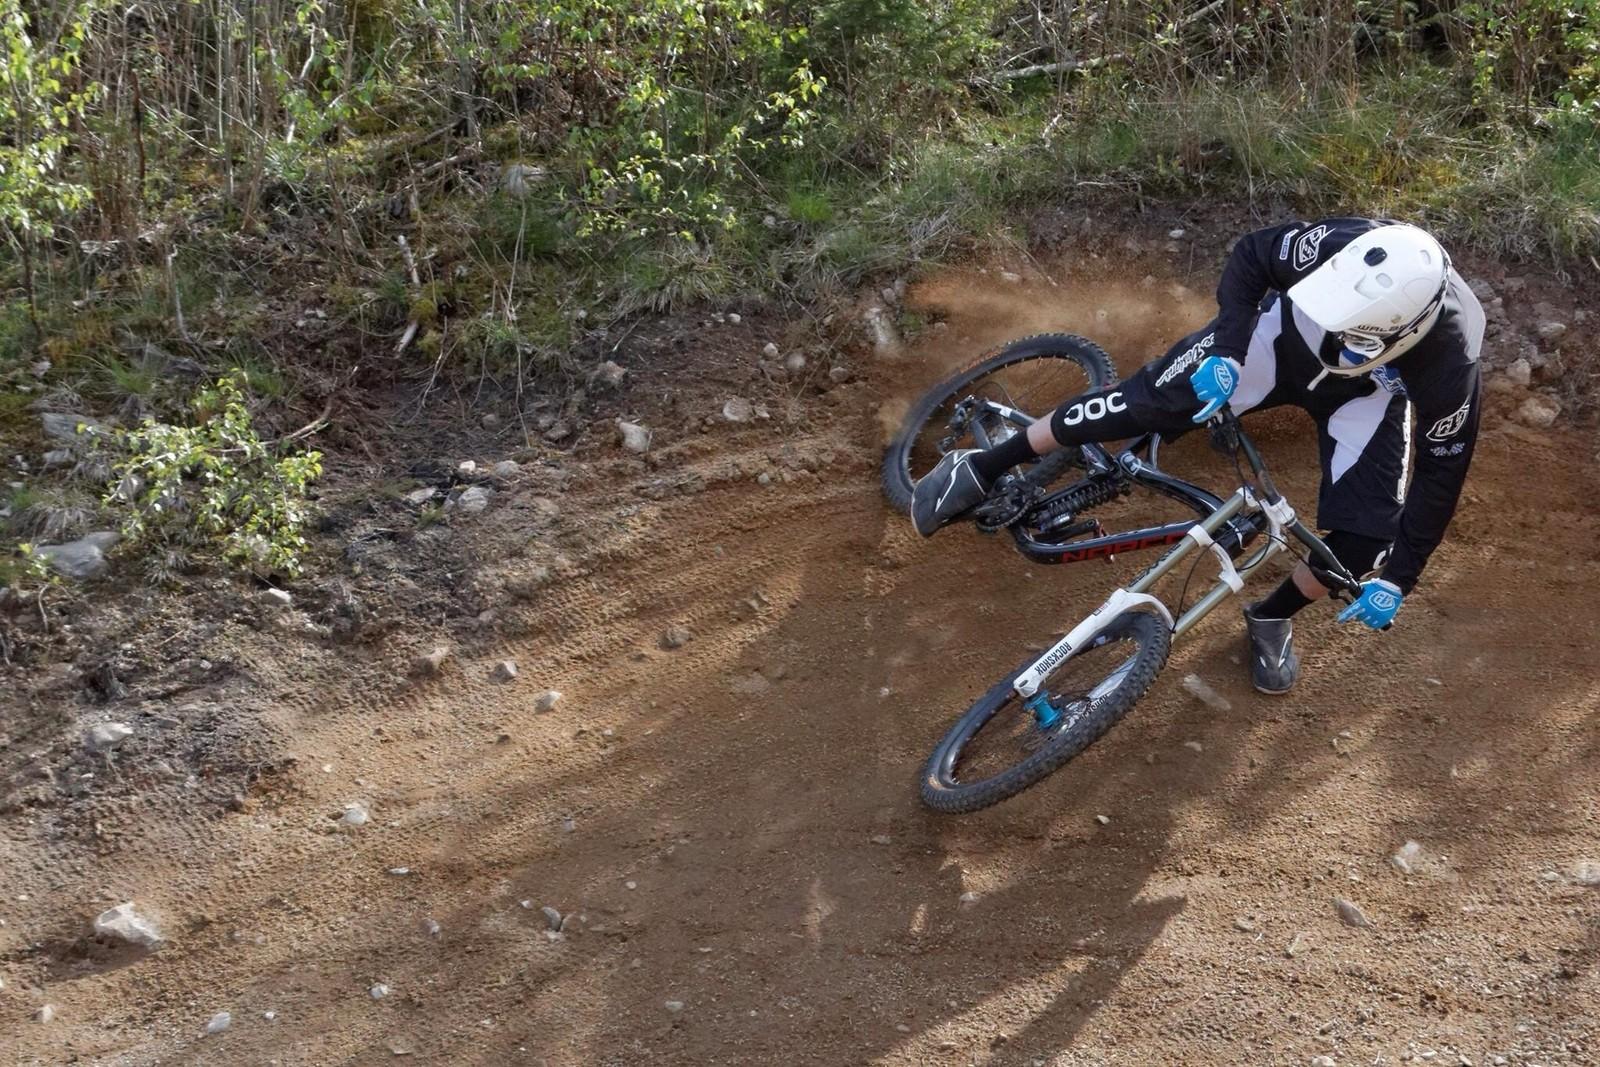 Getting loose - Daniel_Bagge - Mountain Biking Pictures - Vital MTB